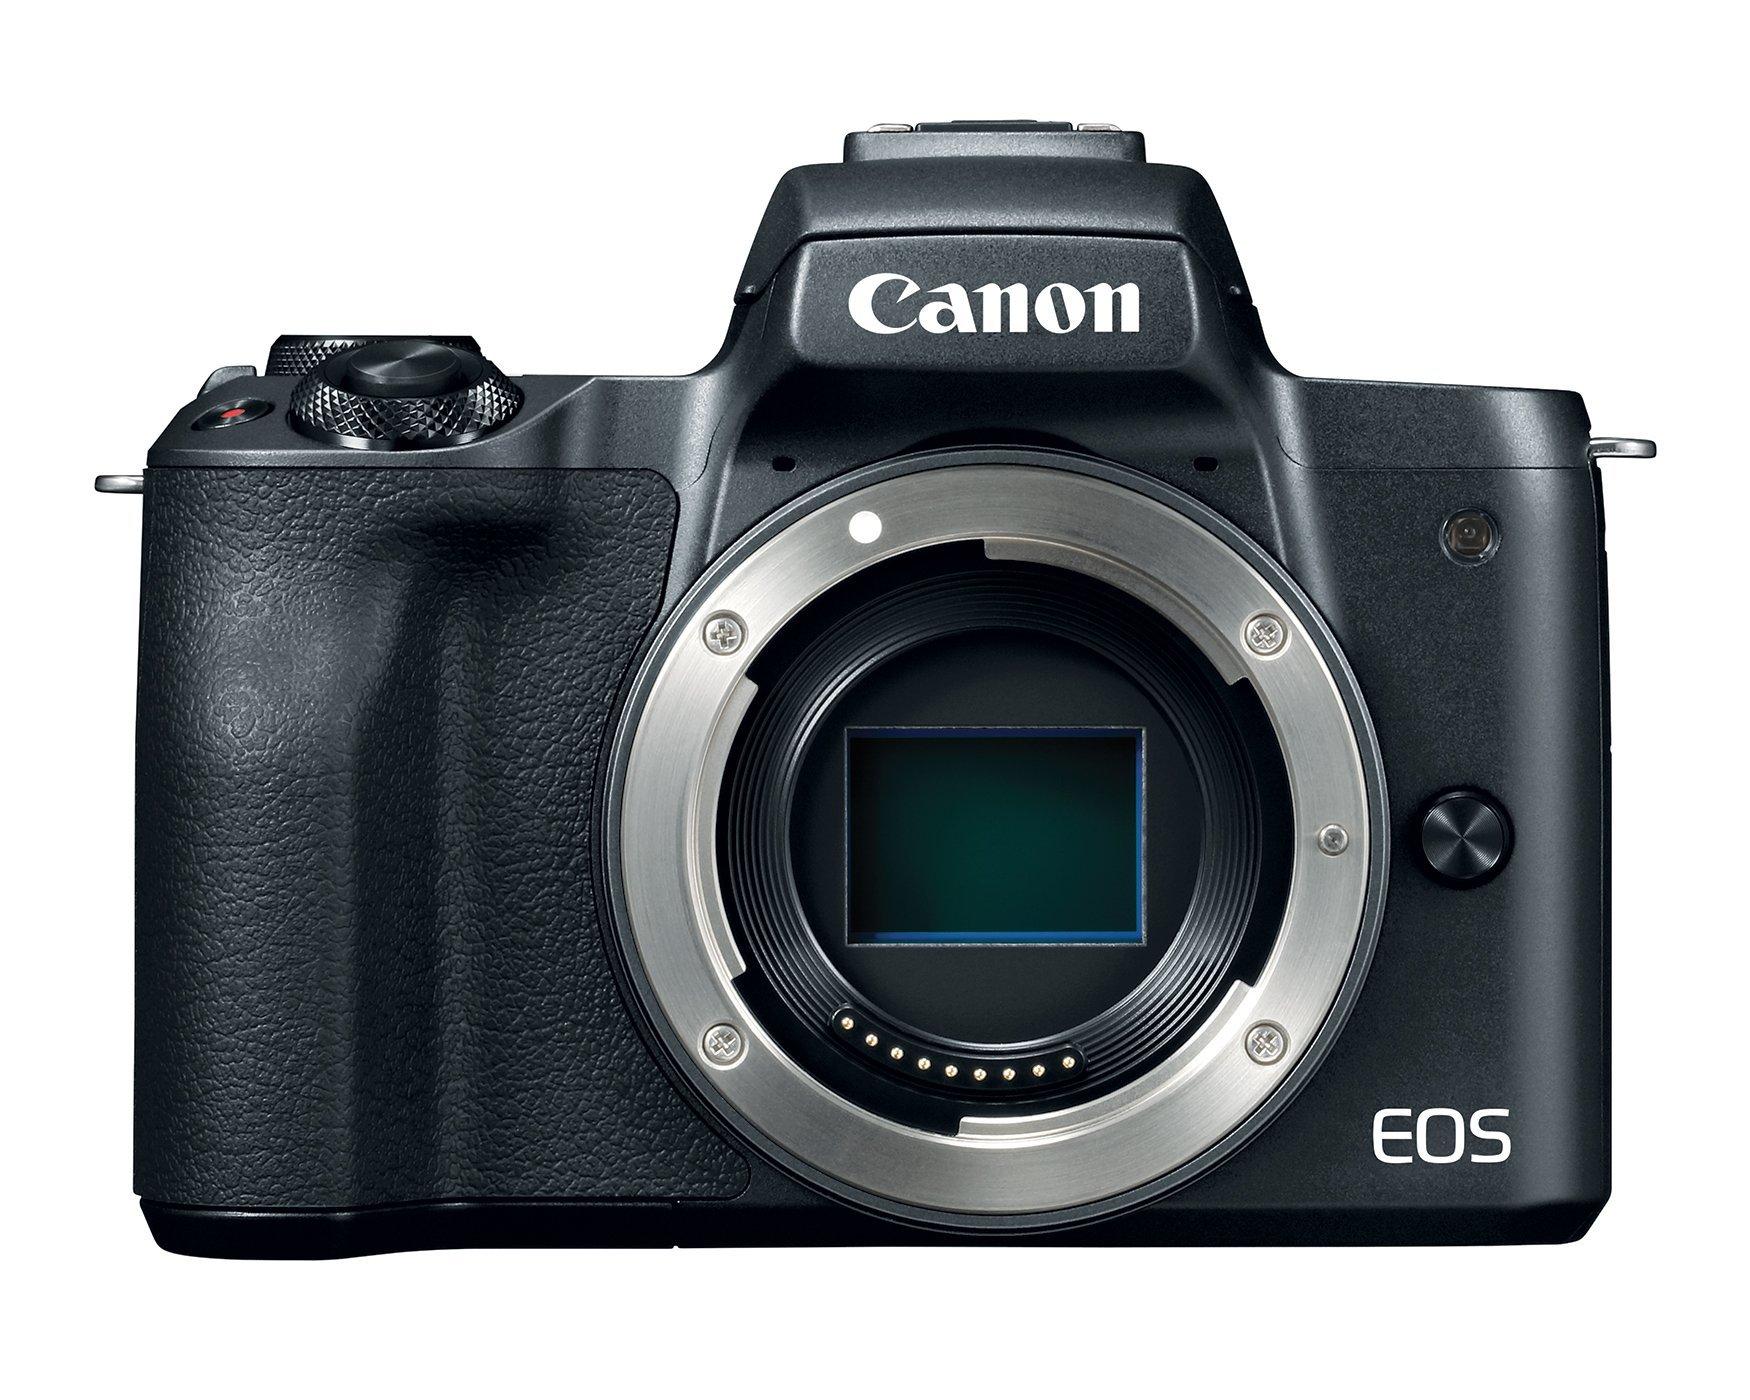 Canon Mirrorless Camera Body [EOS M50] with 4K Video, 24.1 Megapixel (APS-C) CMOS Sensor - Black (Renewed)